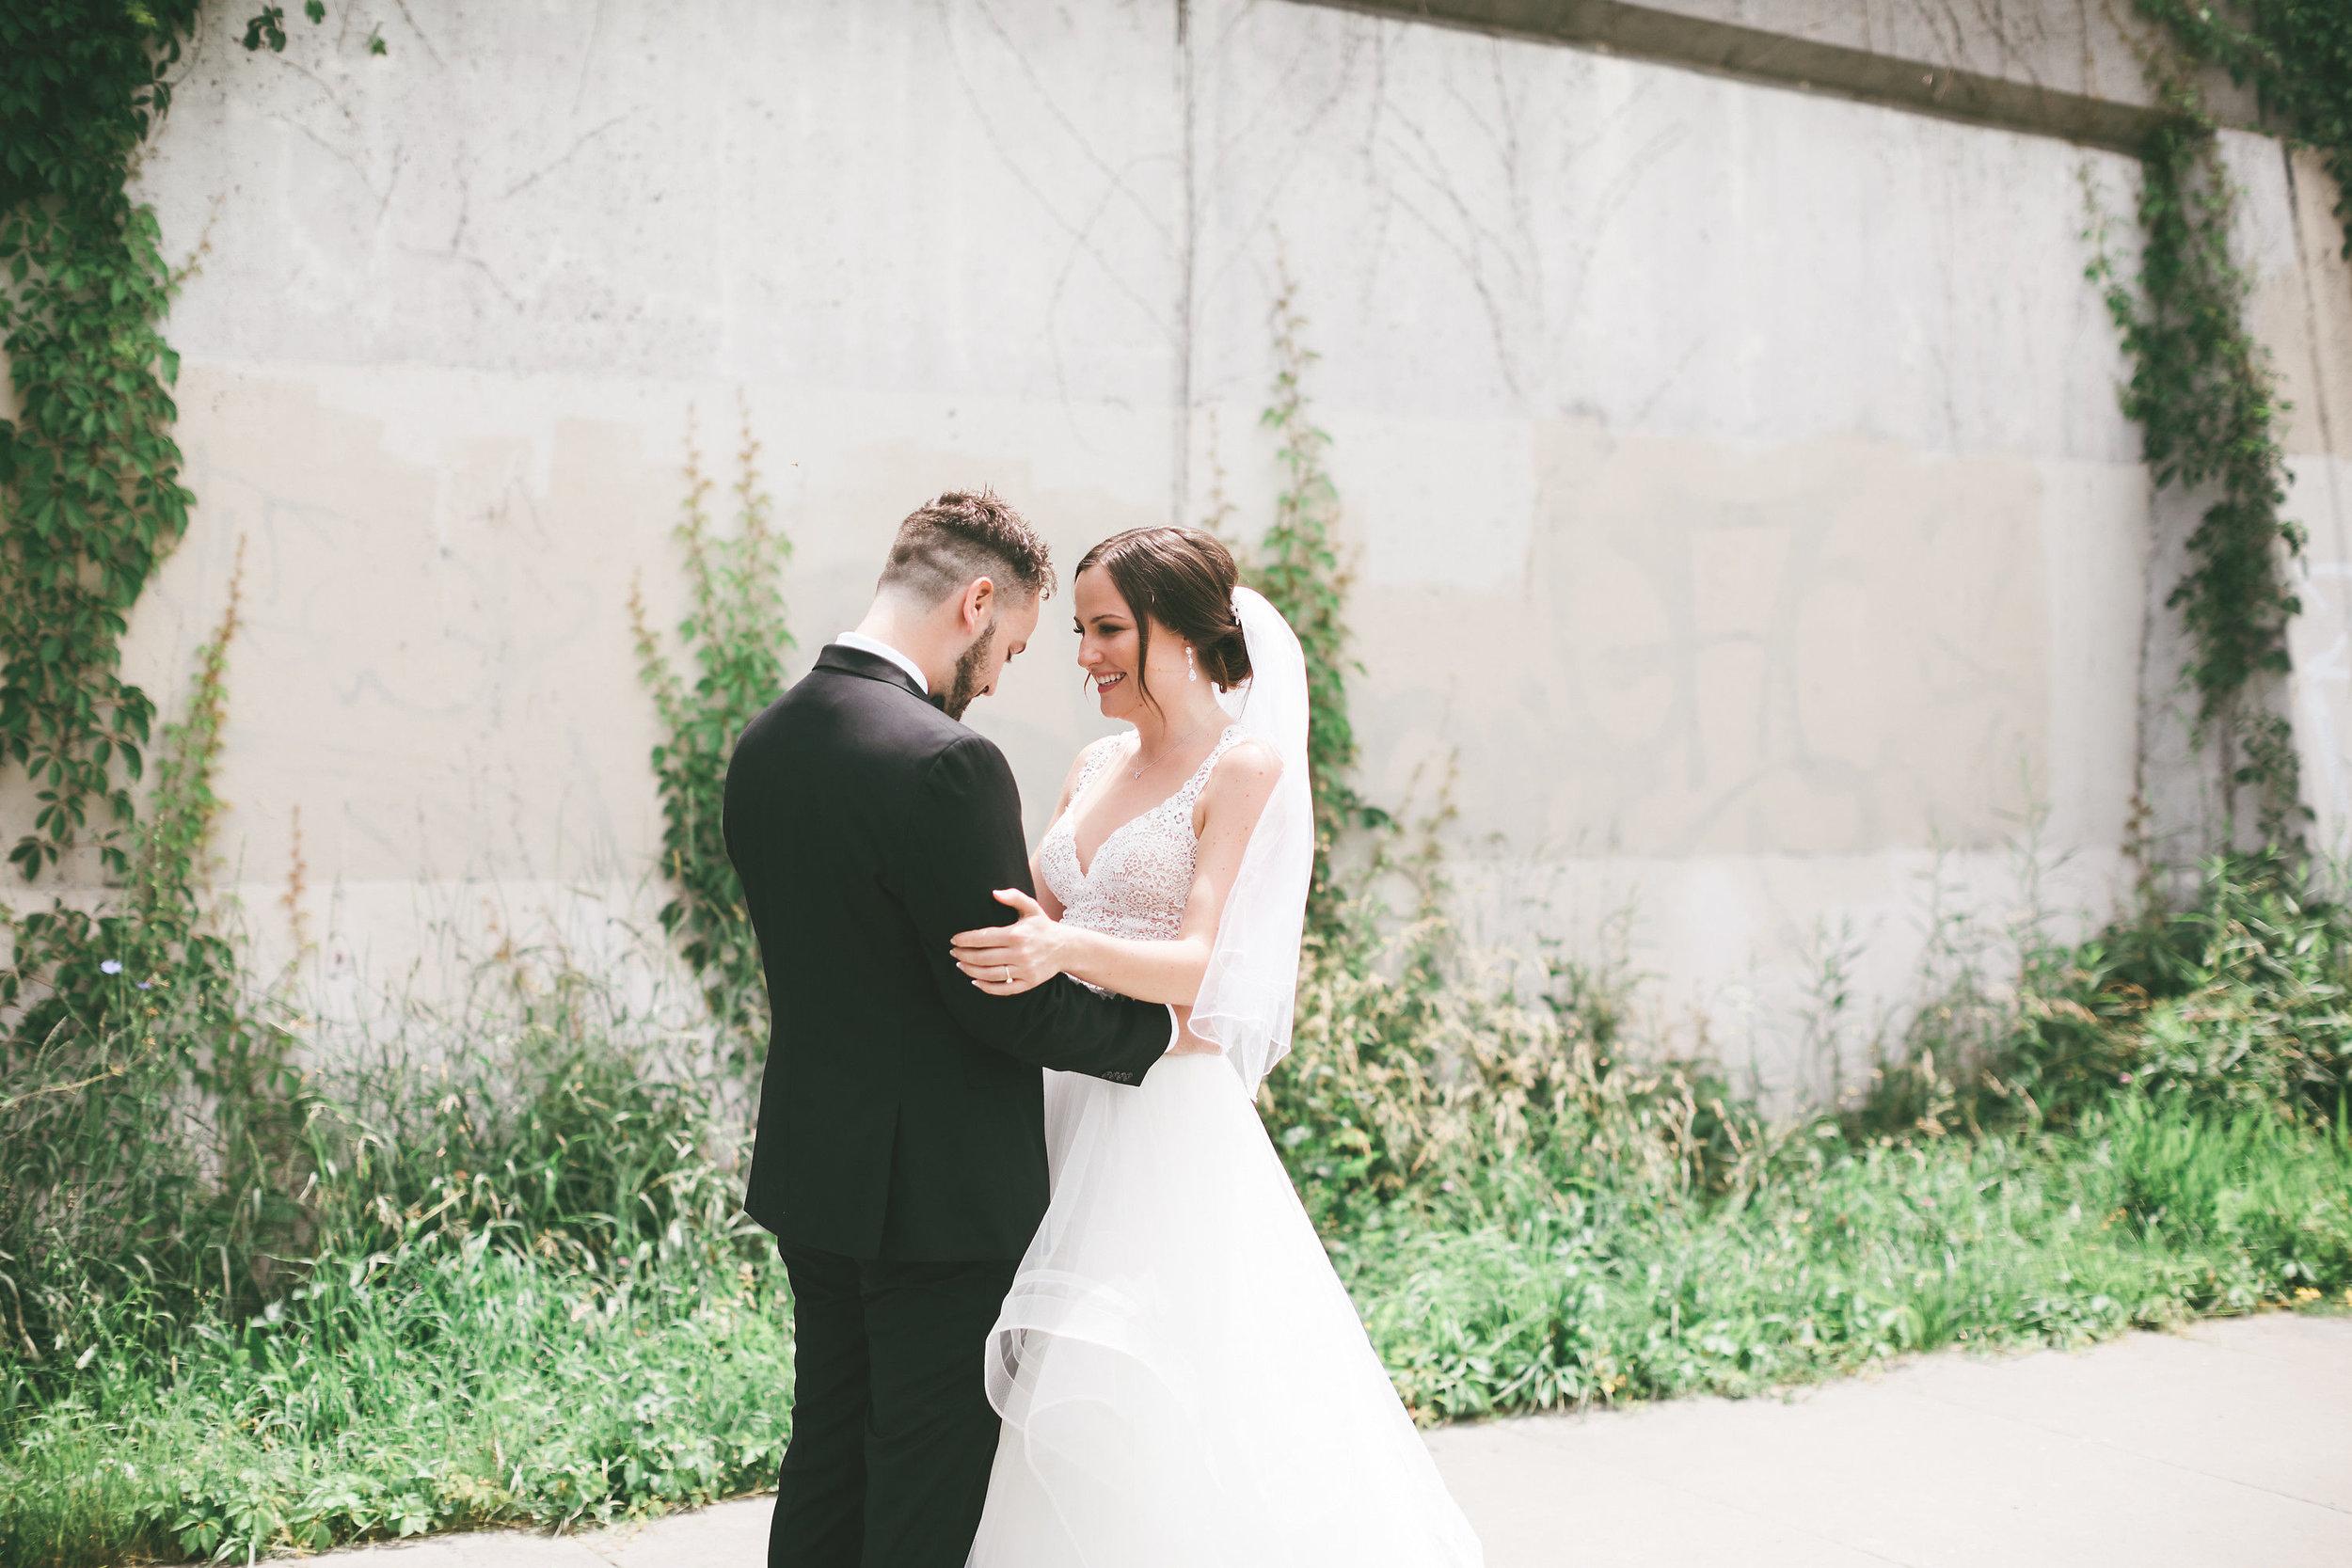 gosia___mike_wedding___lifesreel_danielcaruso___0409.jpg